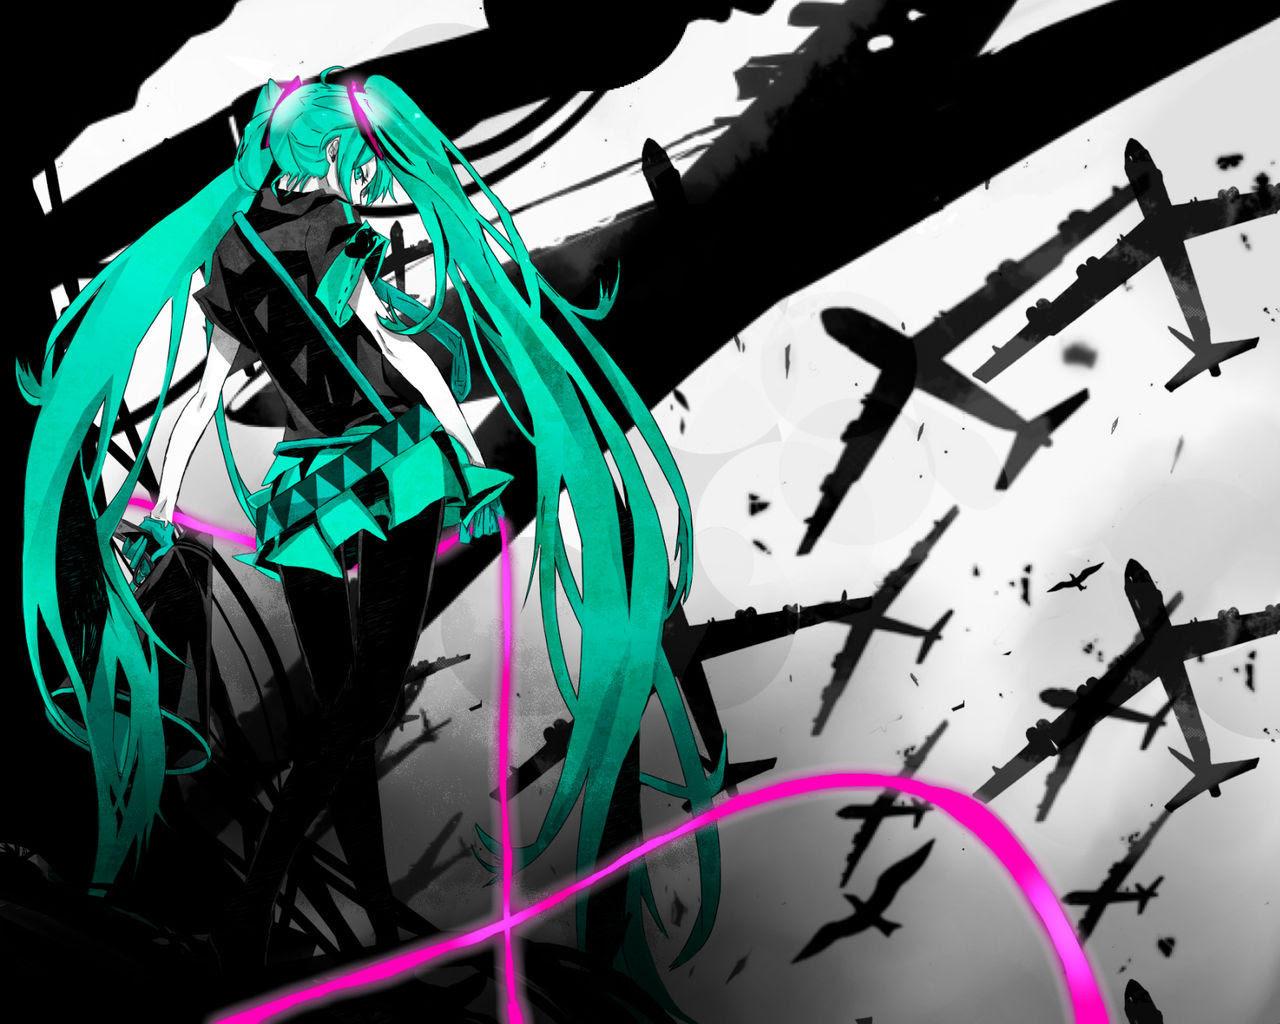 http://24.media.tumblr.com/tumblr_maxg2vNXfp1rq5j7so1_1280.jpg